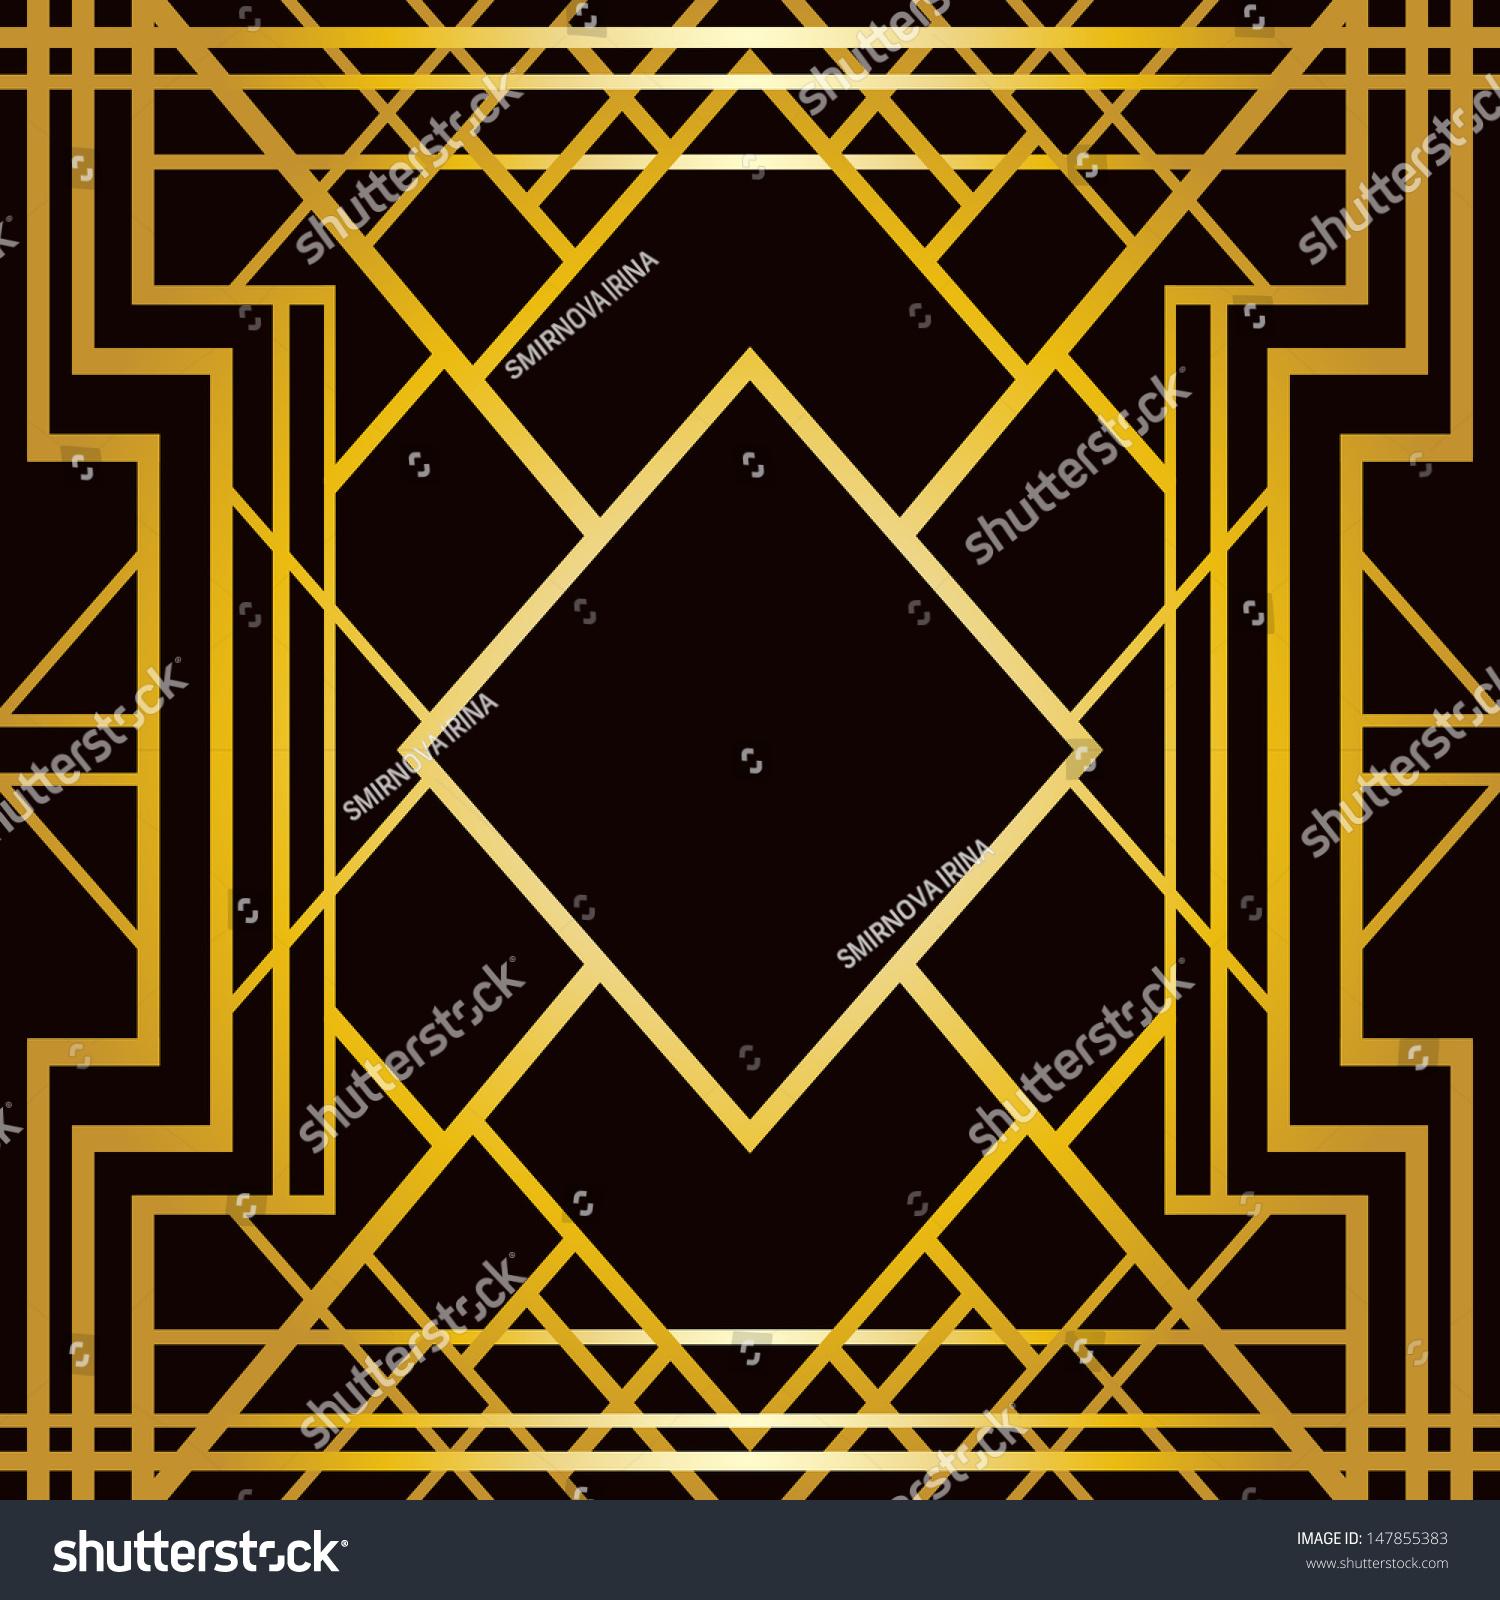 Art deco geometric pattern 1920s style stock vector for Art deco look